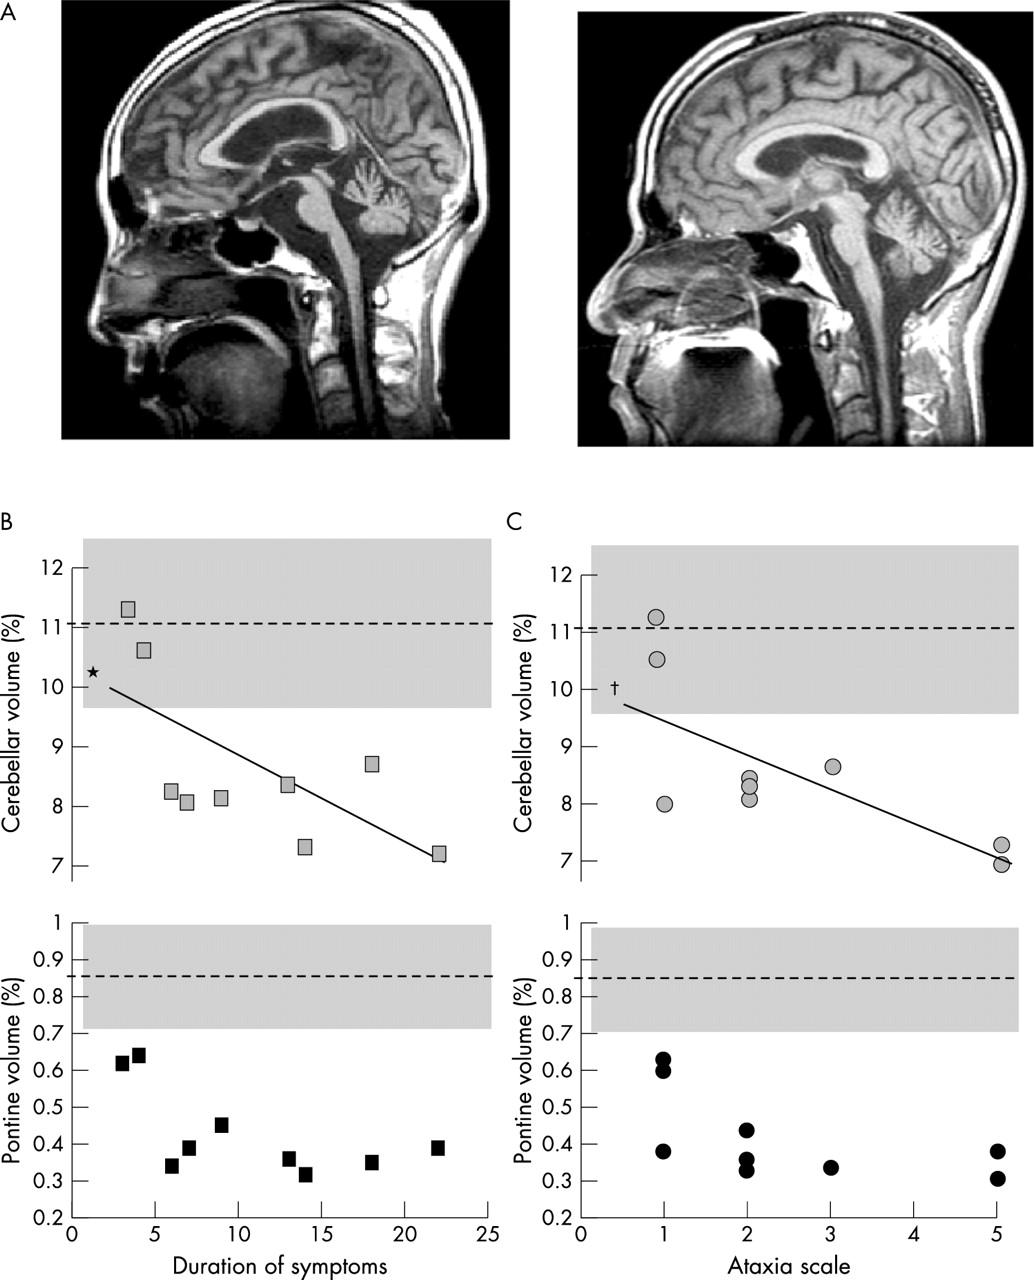 spinocerebellar atrophy Mr brain scans demonstrate cerebellar atrophy infantile-onset spinocerebellar ataxia posterior column and retinitis pigmentosa spinocerebellar ataxia type 8 spinocerebellar ataxia type 10 spinocerebellar ataxia type 14 sporadic spinocerebellar ataxia x-linked sideroblastic anemia.